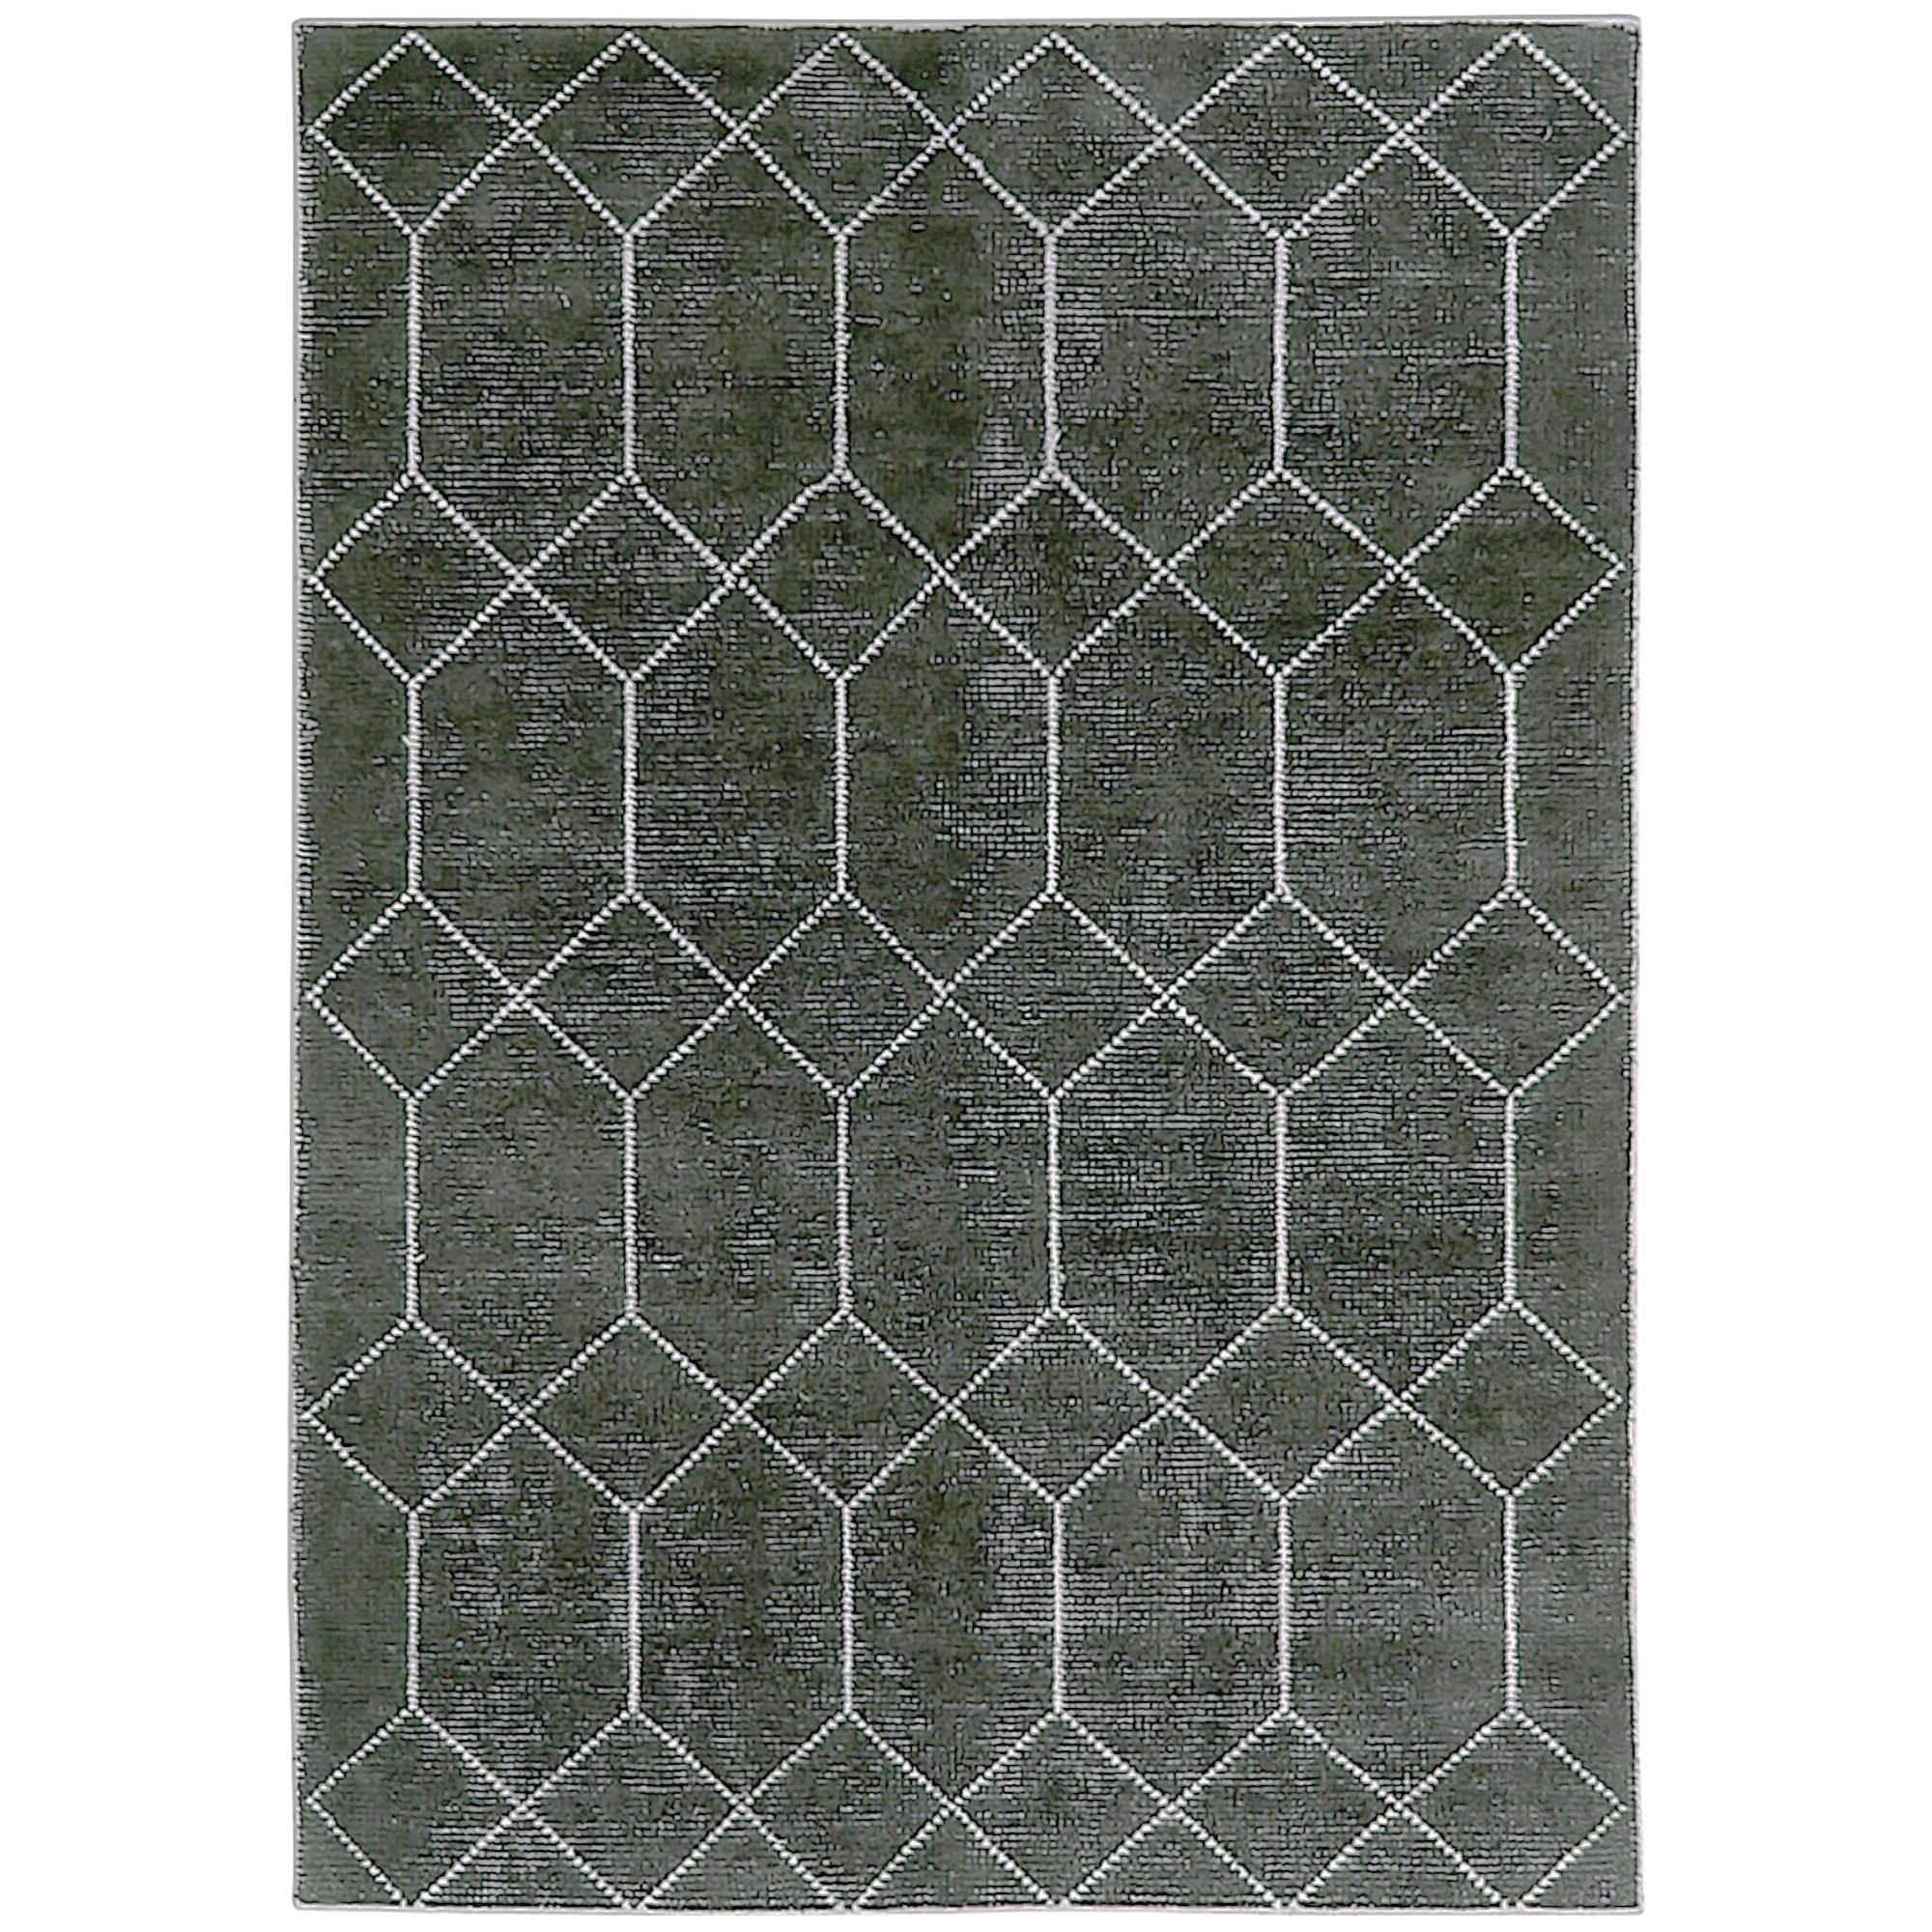 Geometrics Hand Knotted Wool Rug, 250x300cm, Black